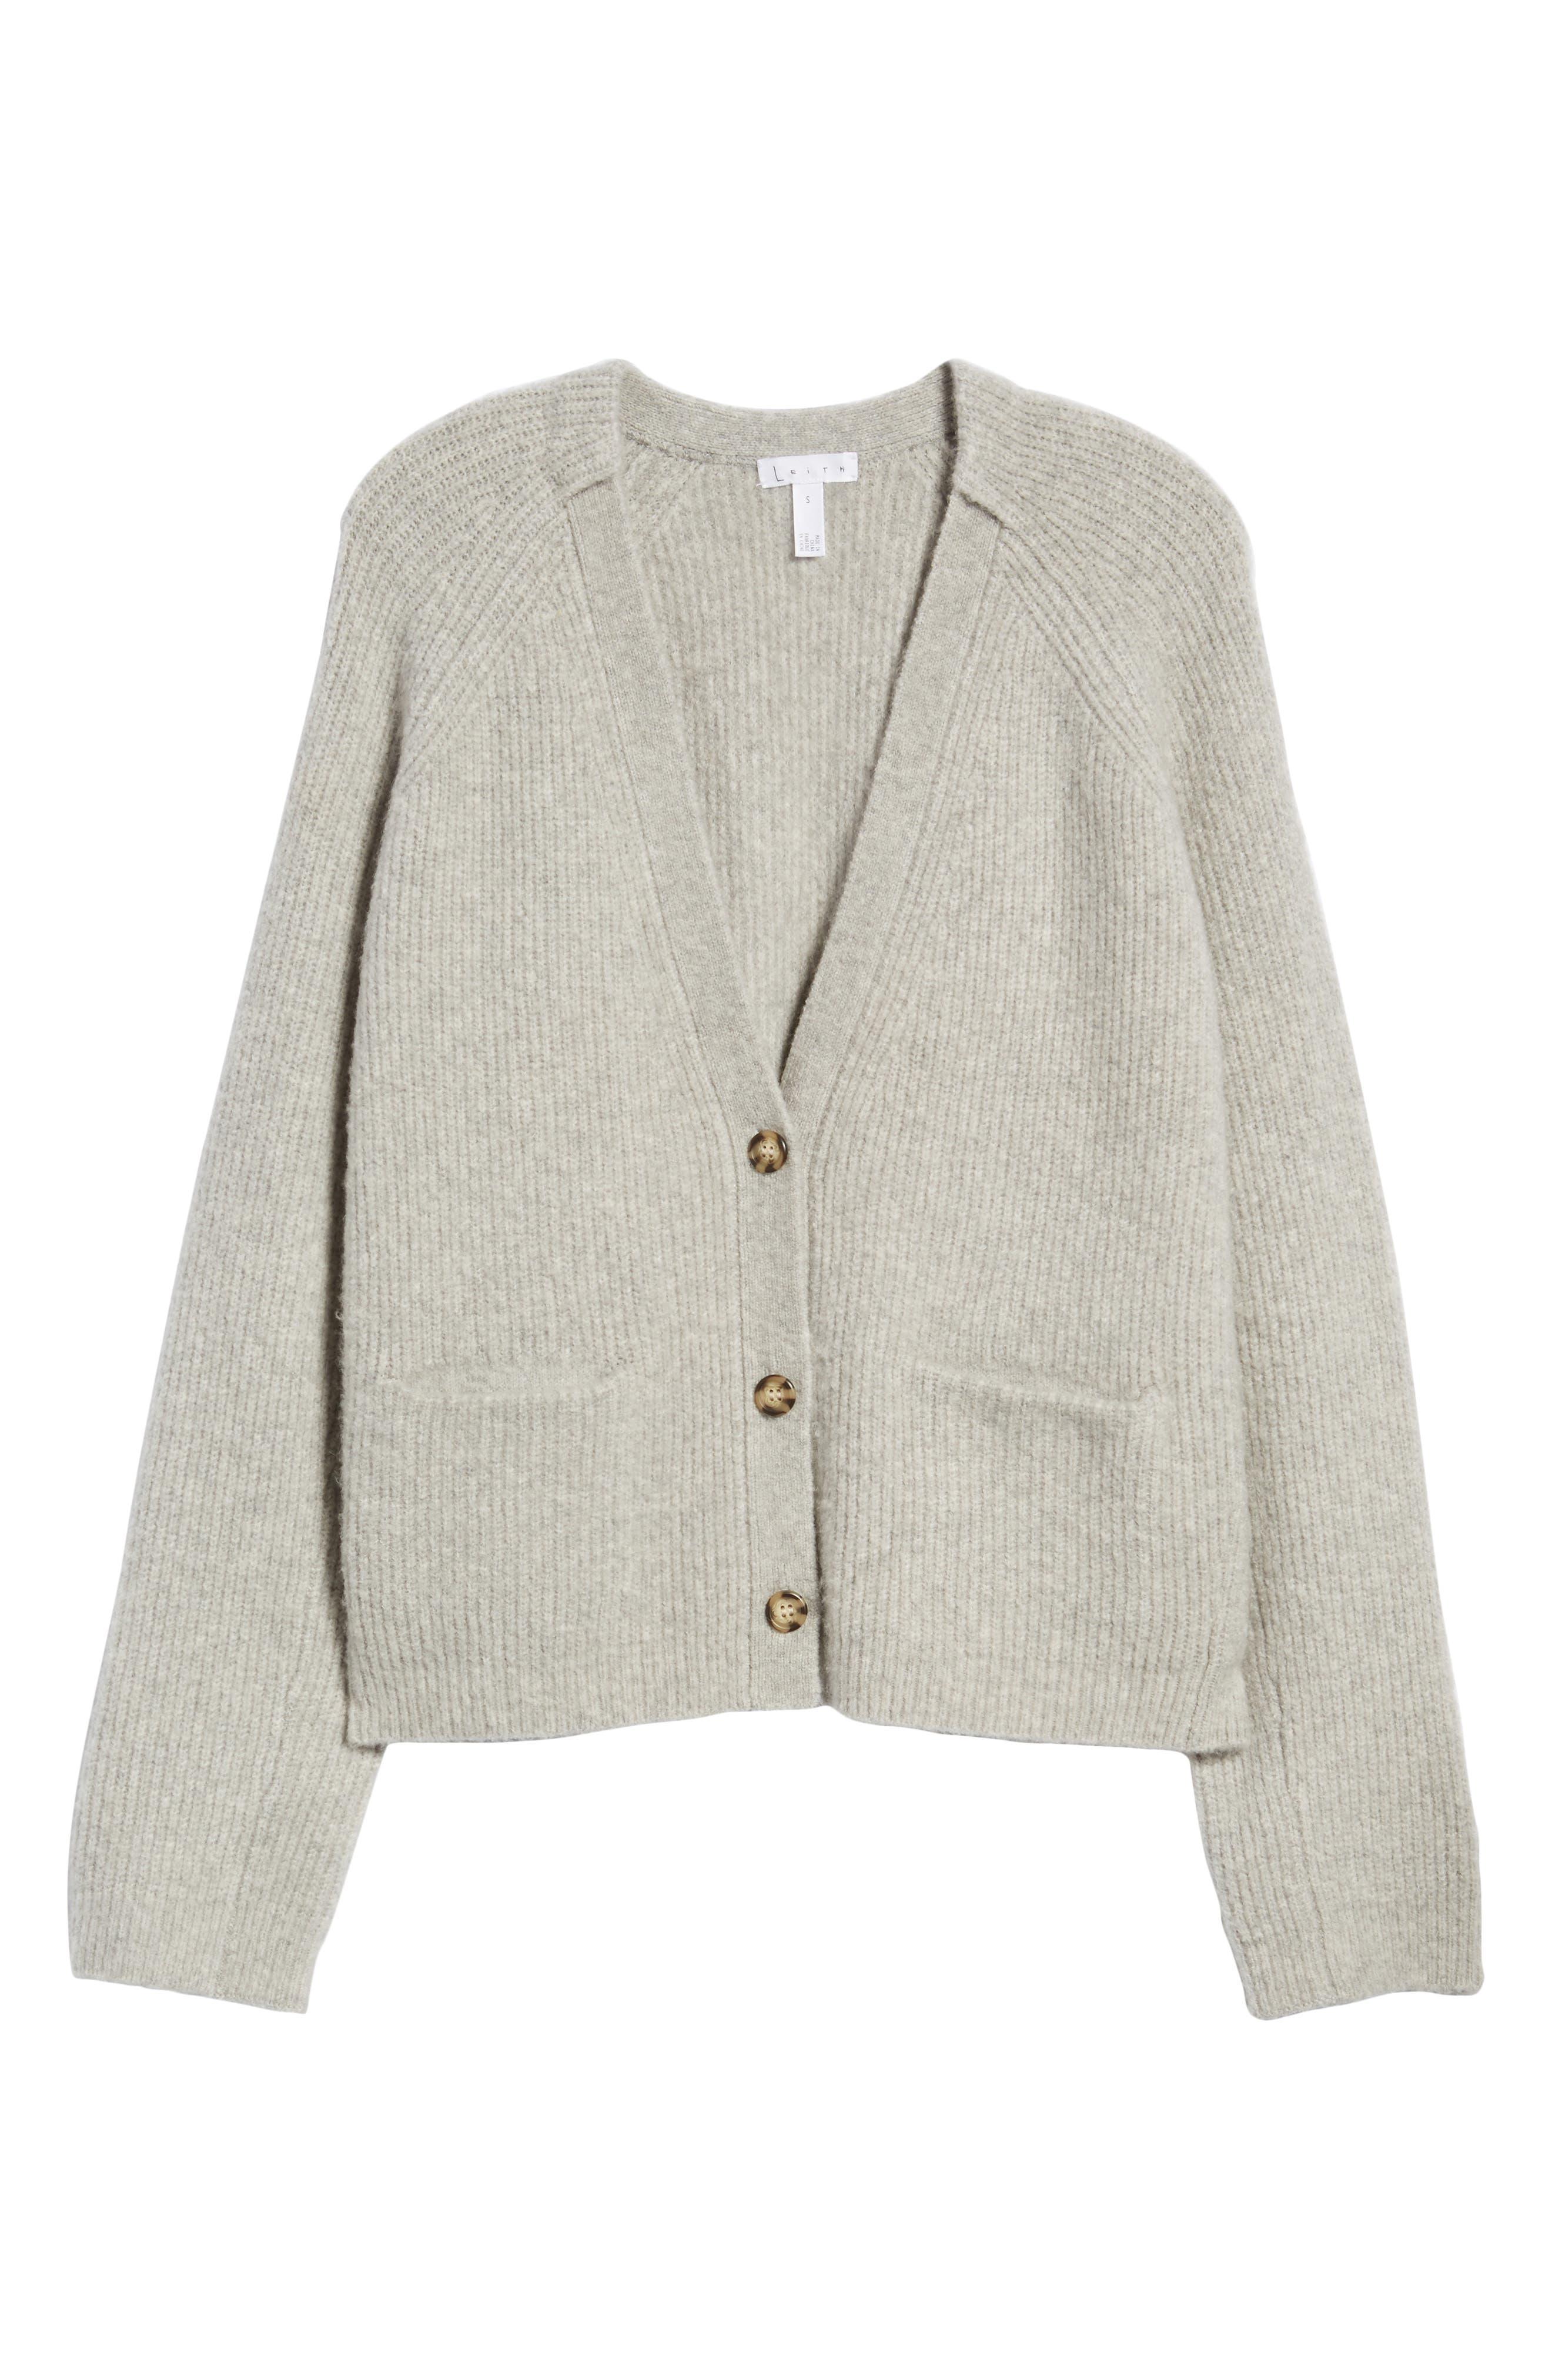 Cardigan Sweater,                             Alternate thumbnail 6, color,                             Grey Med Htr